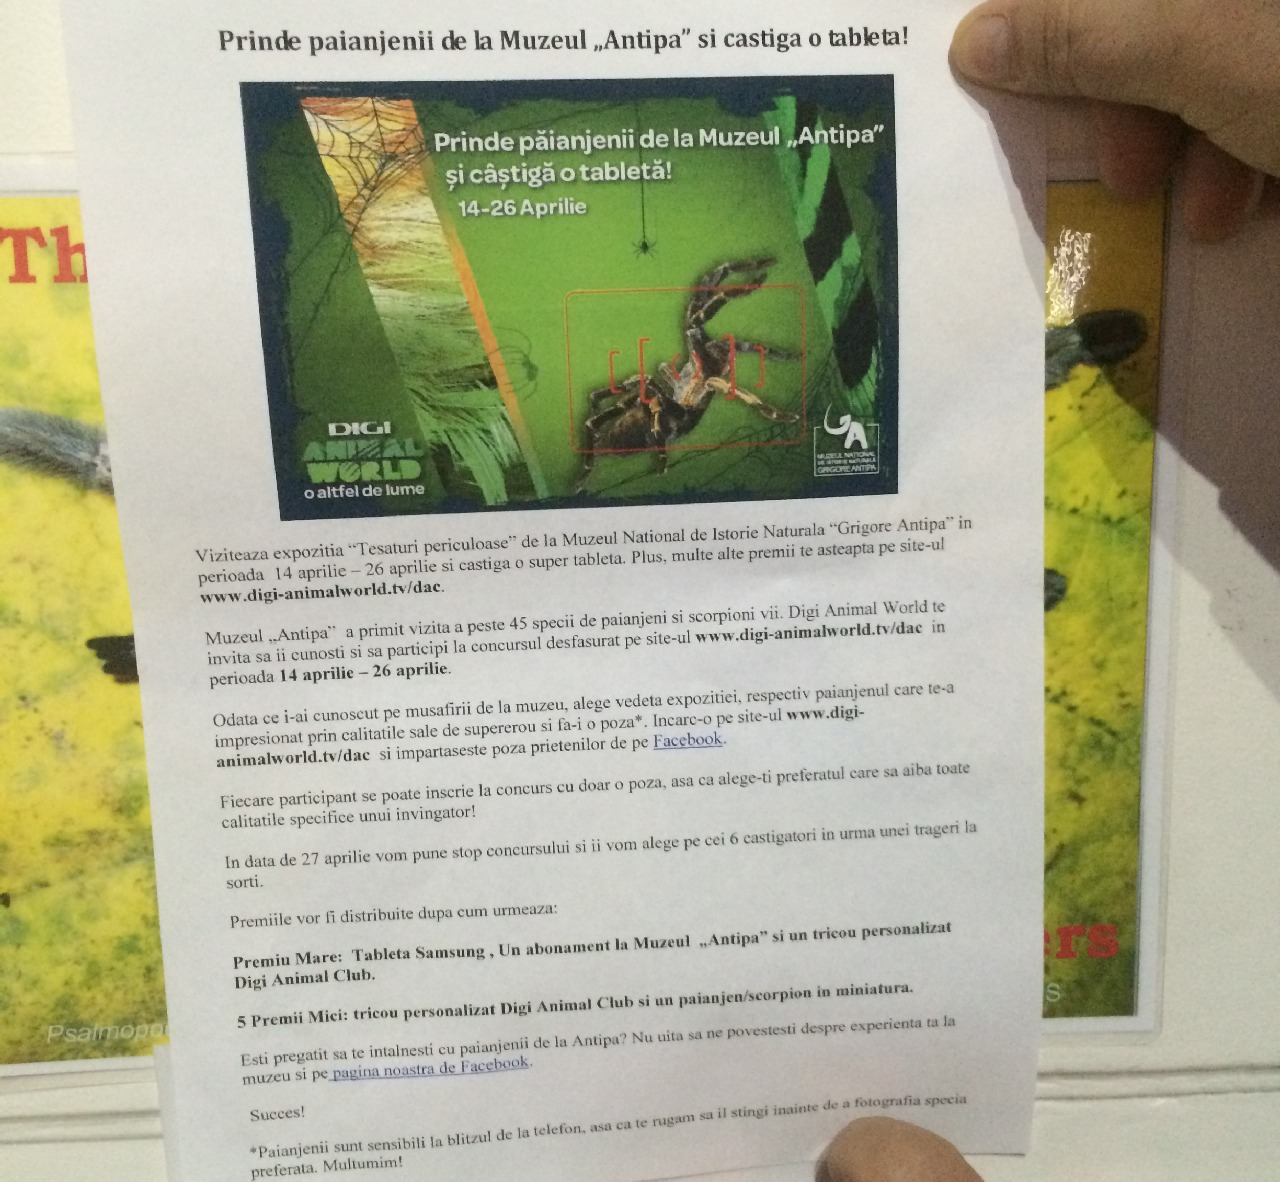 Detaliile concursului Digi Animal Club